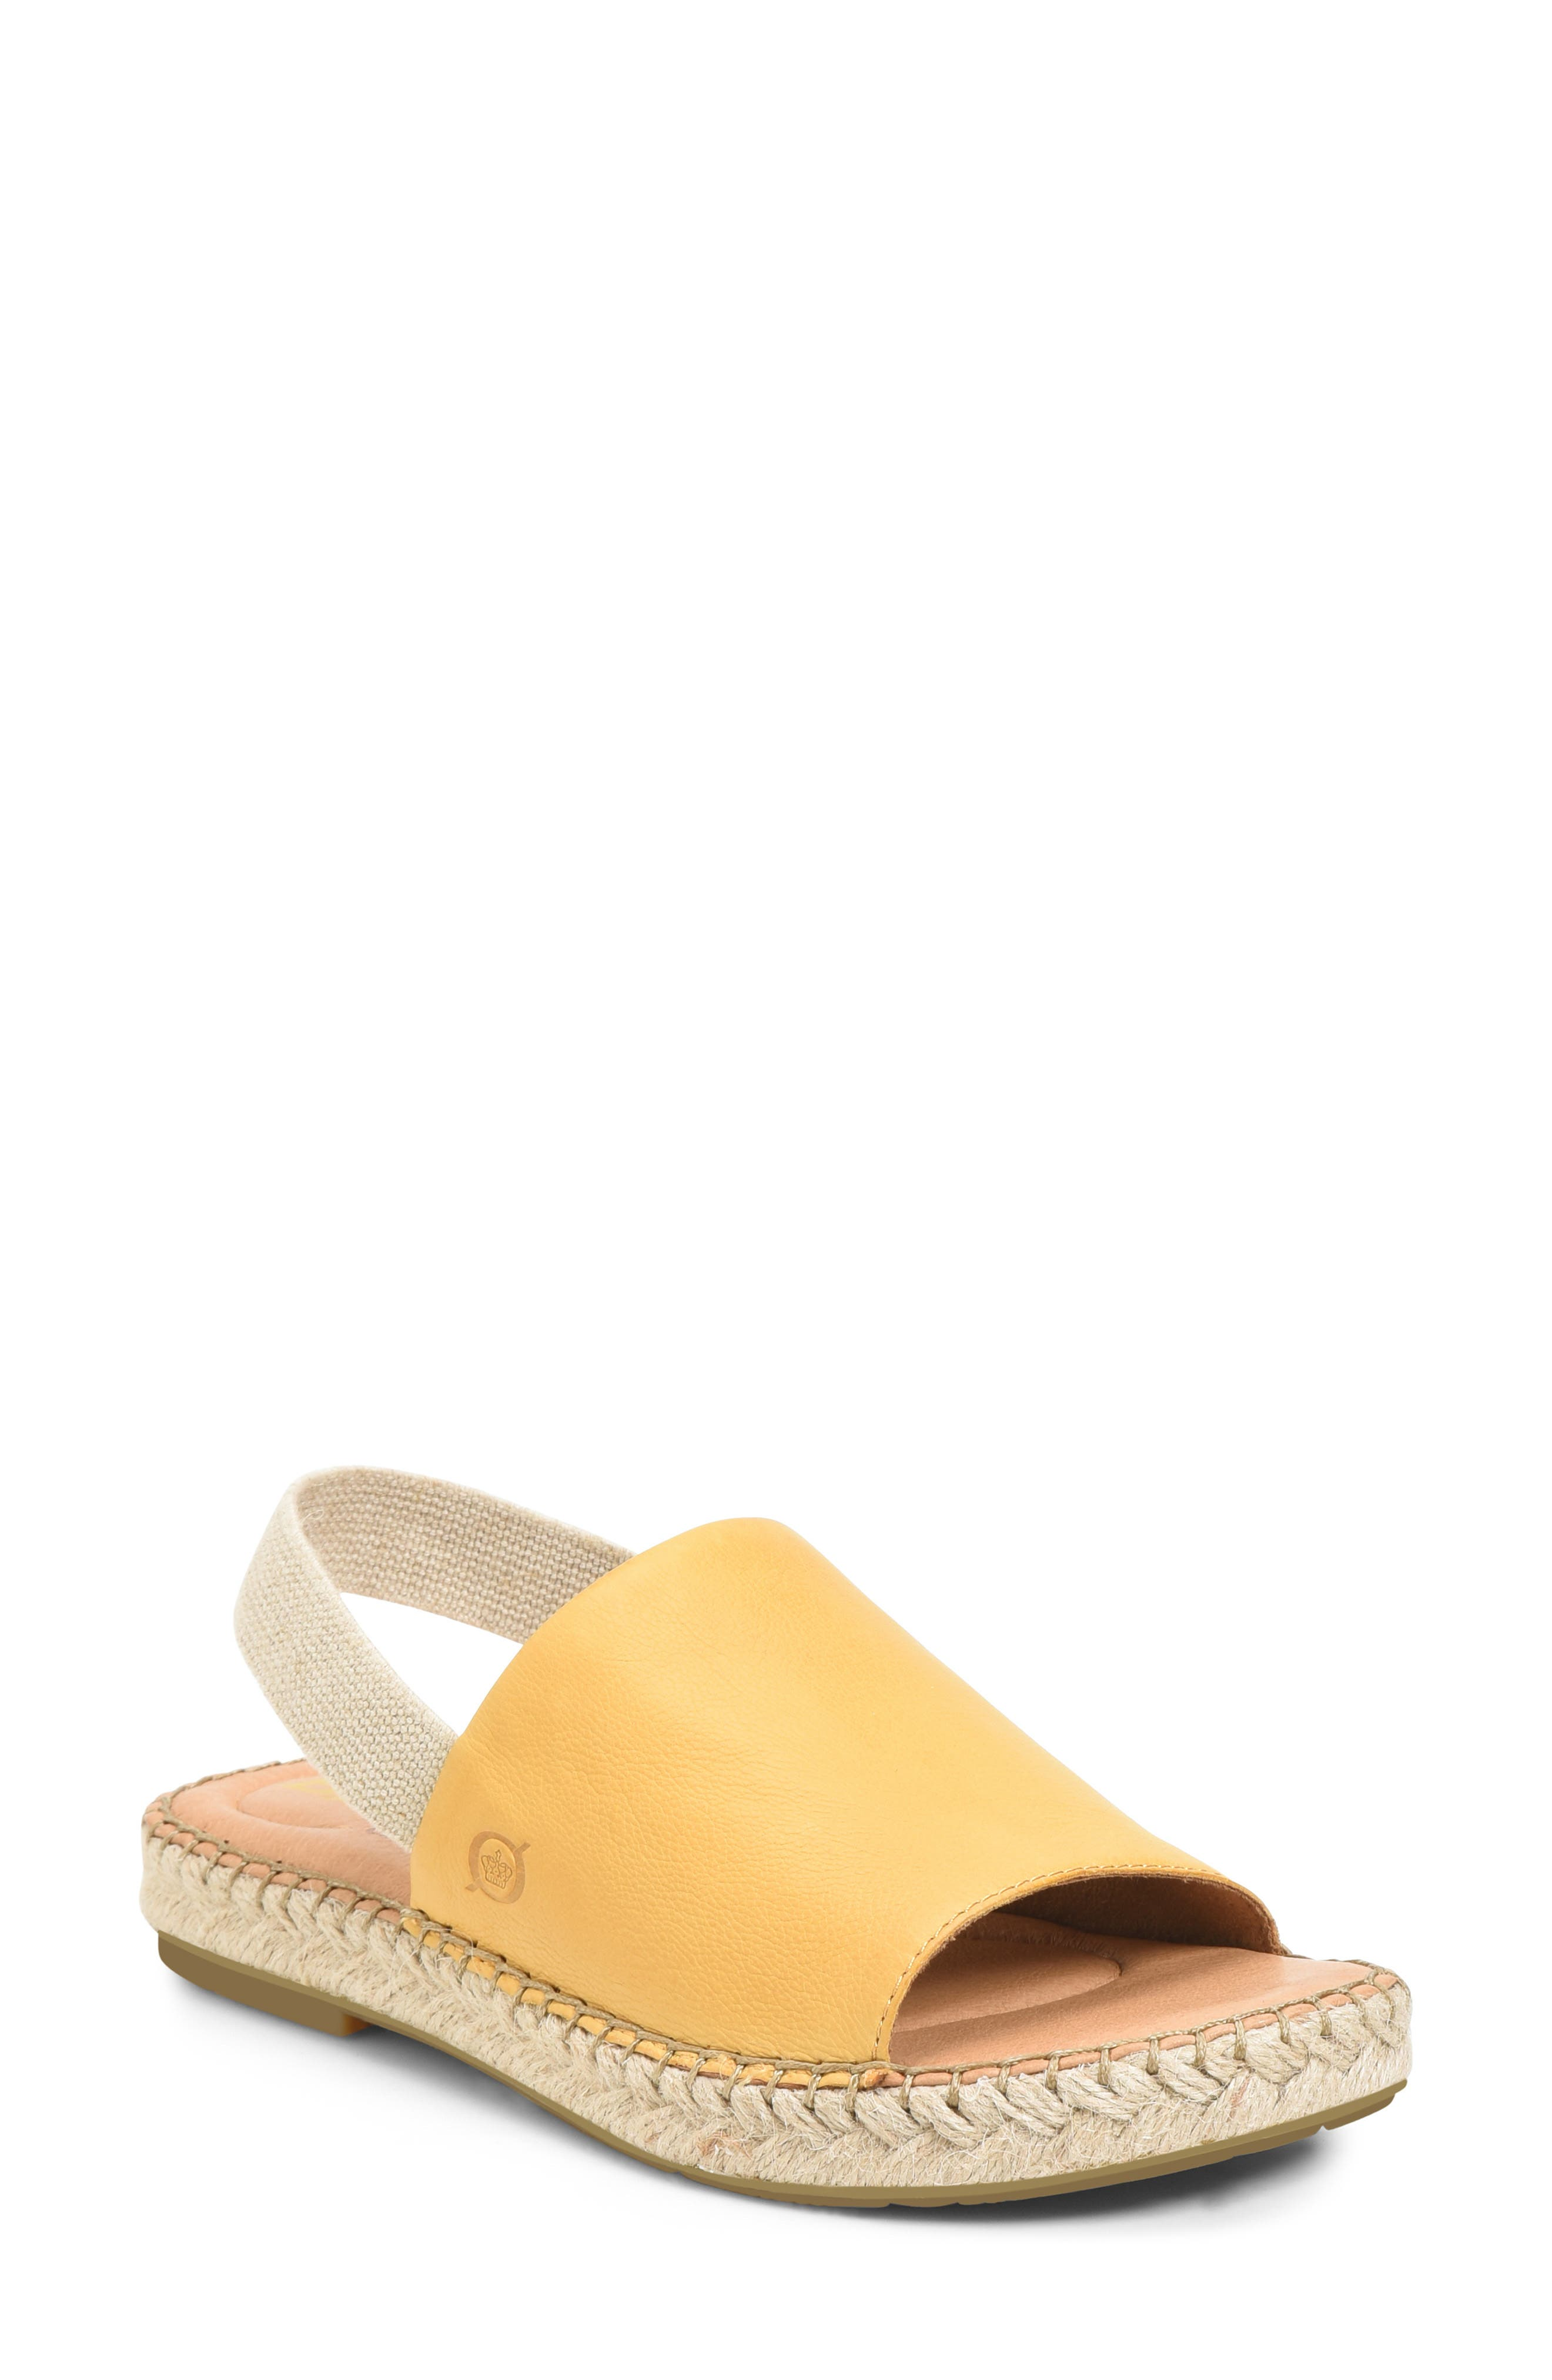 Yellow Espadrilles for Women   Nordstrom